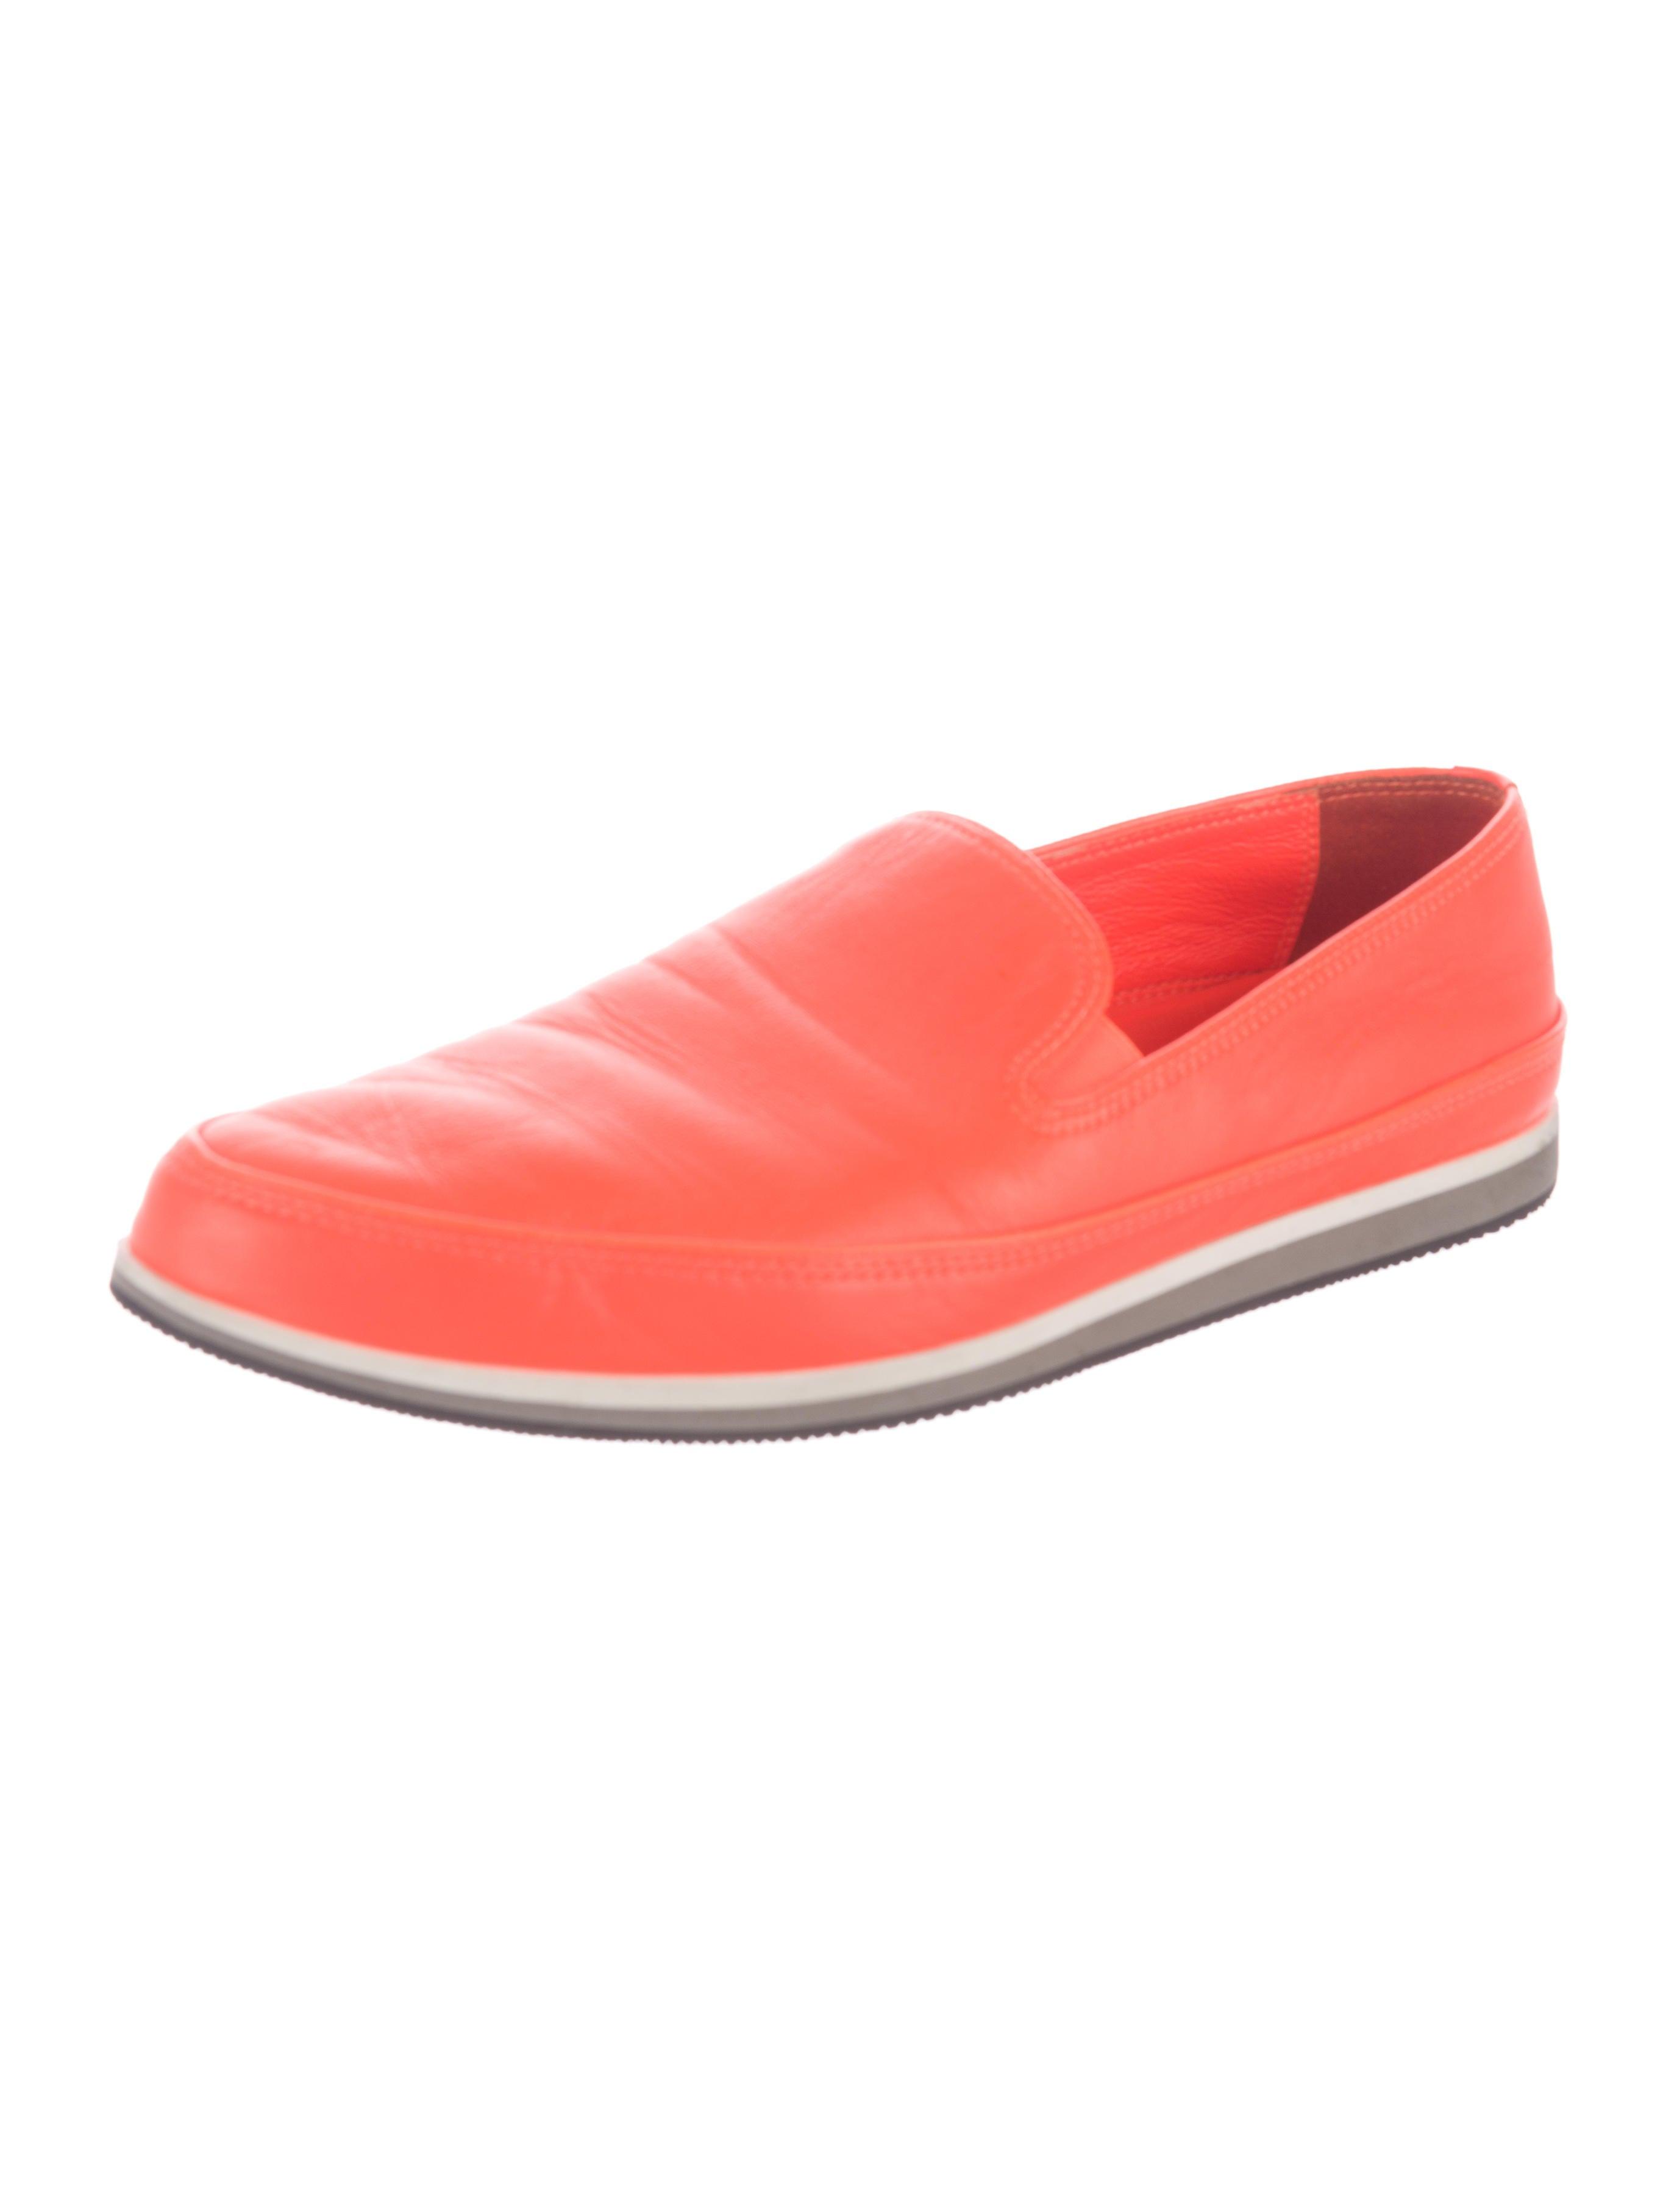 prada sport leather slip on sneakers shoes wpr39901